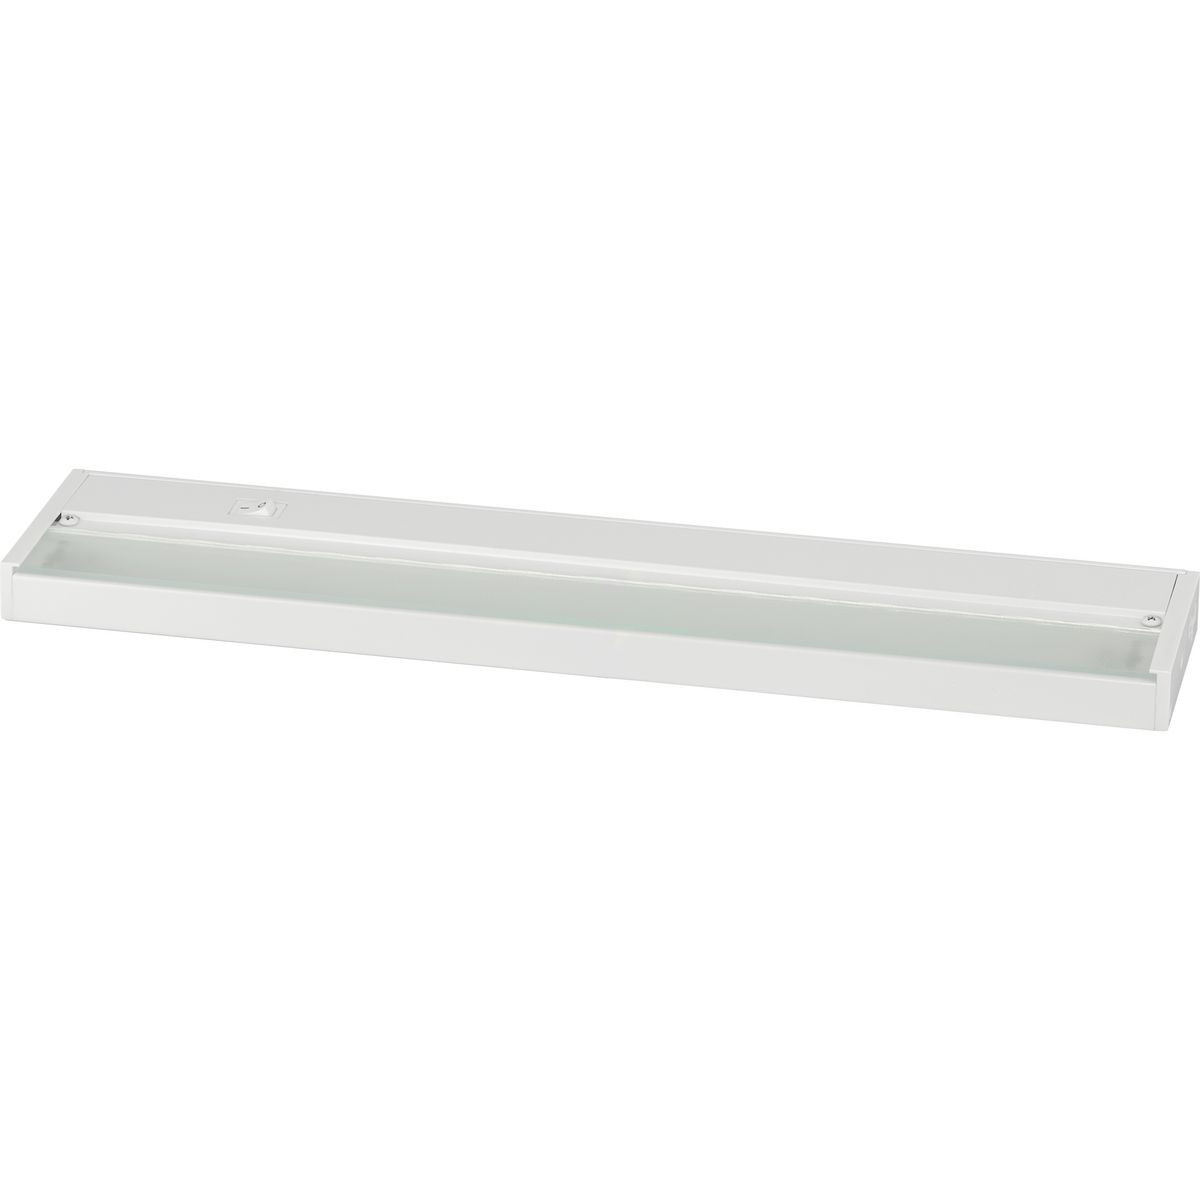 18 IN LED 3000K UNDER CABINET White